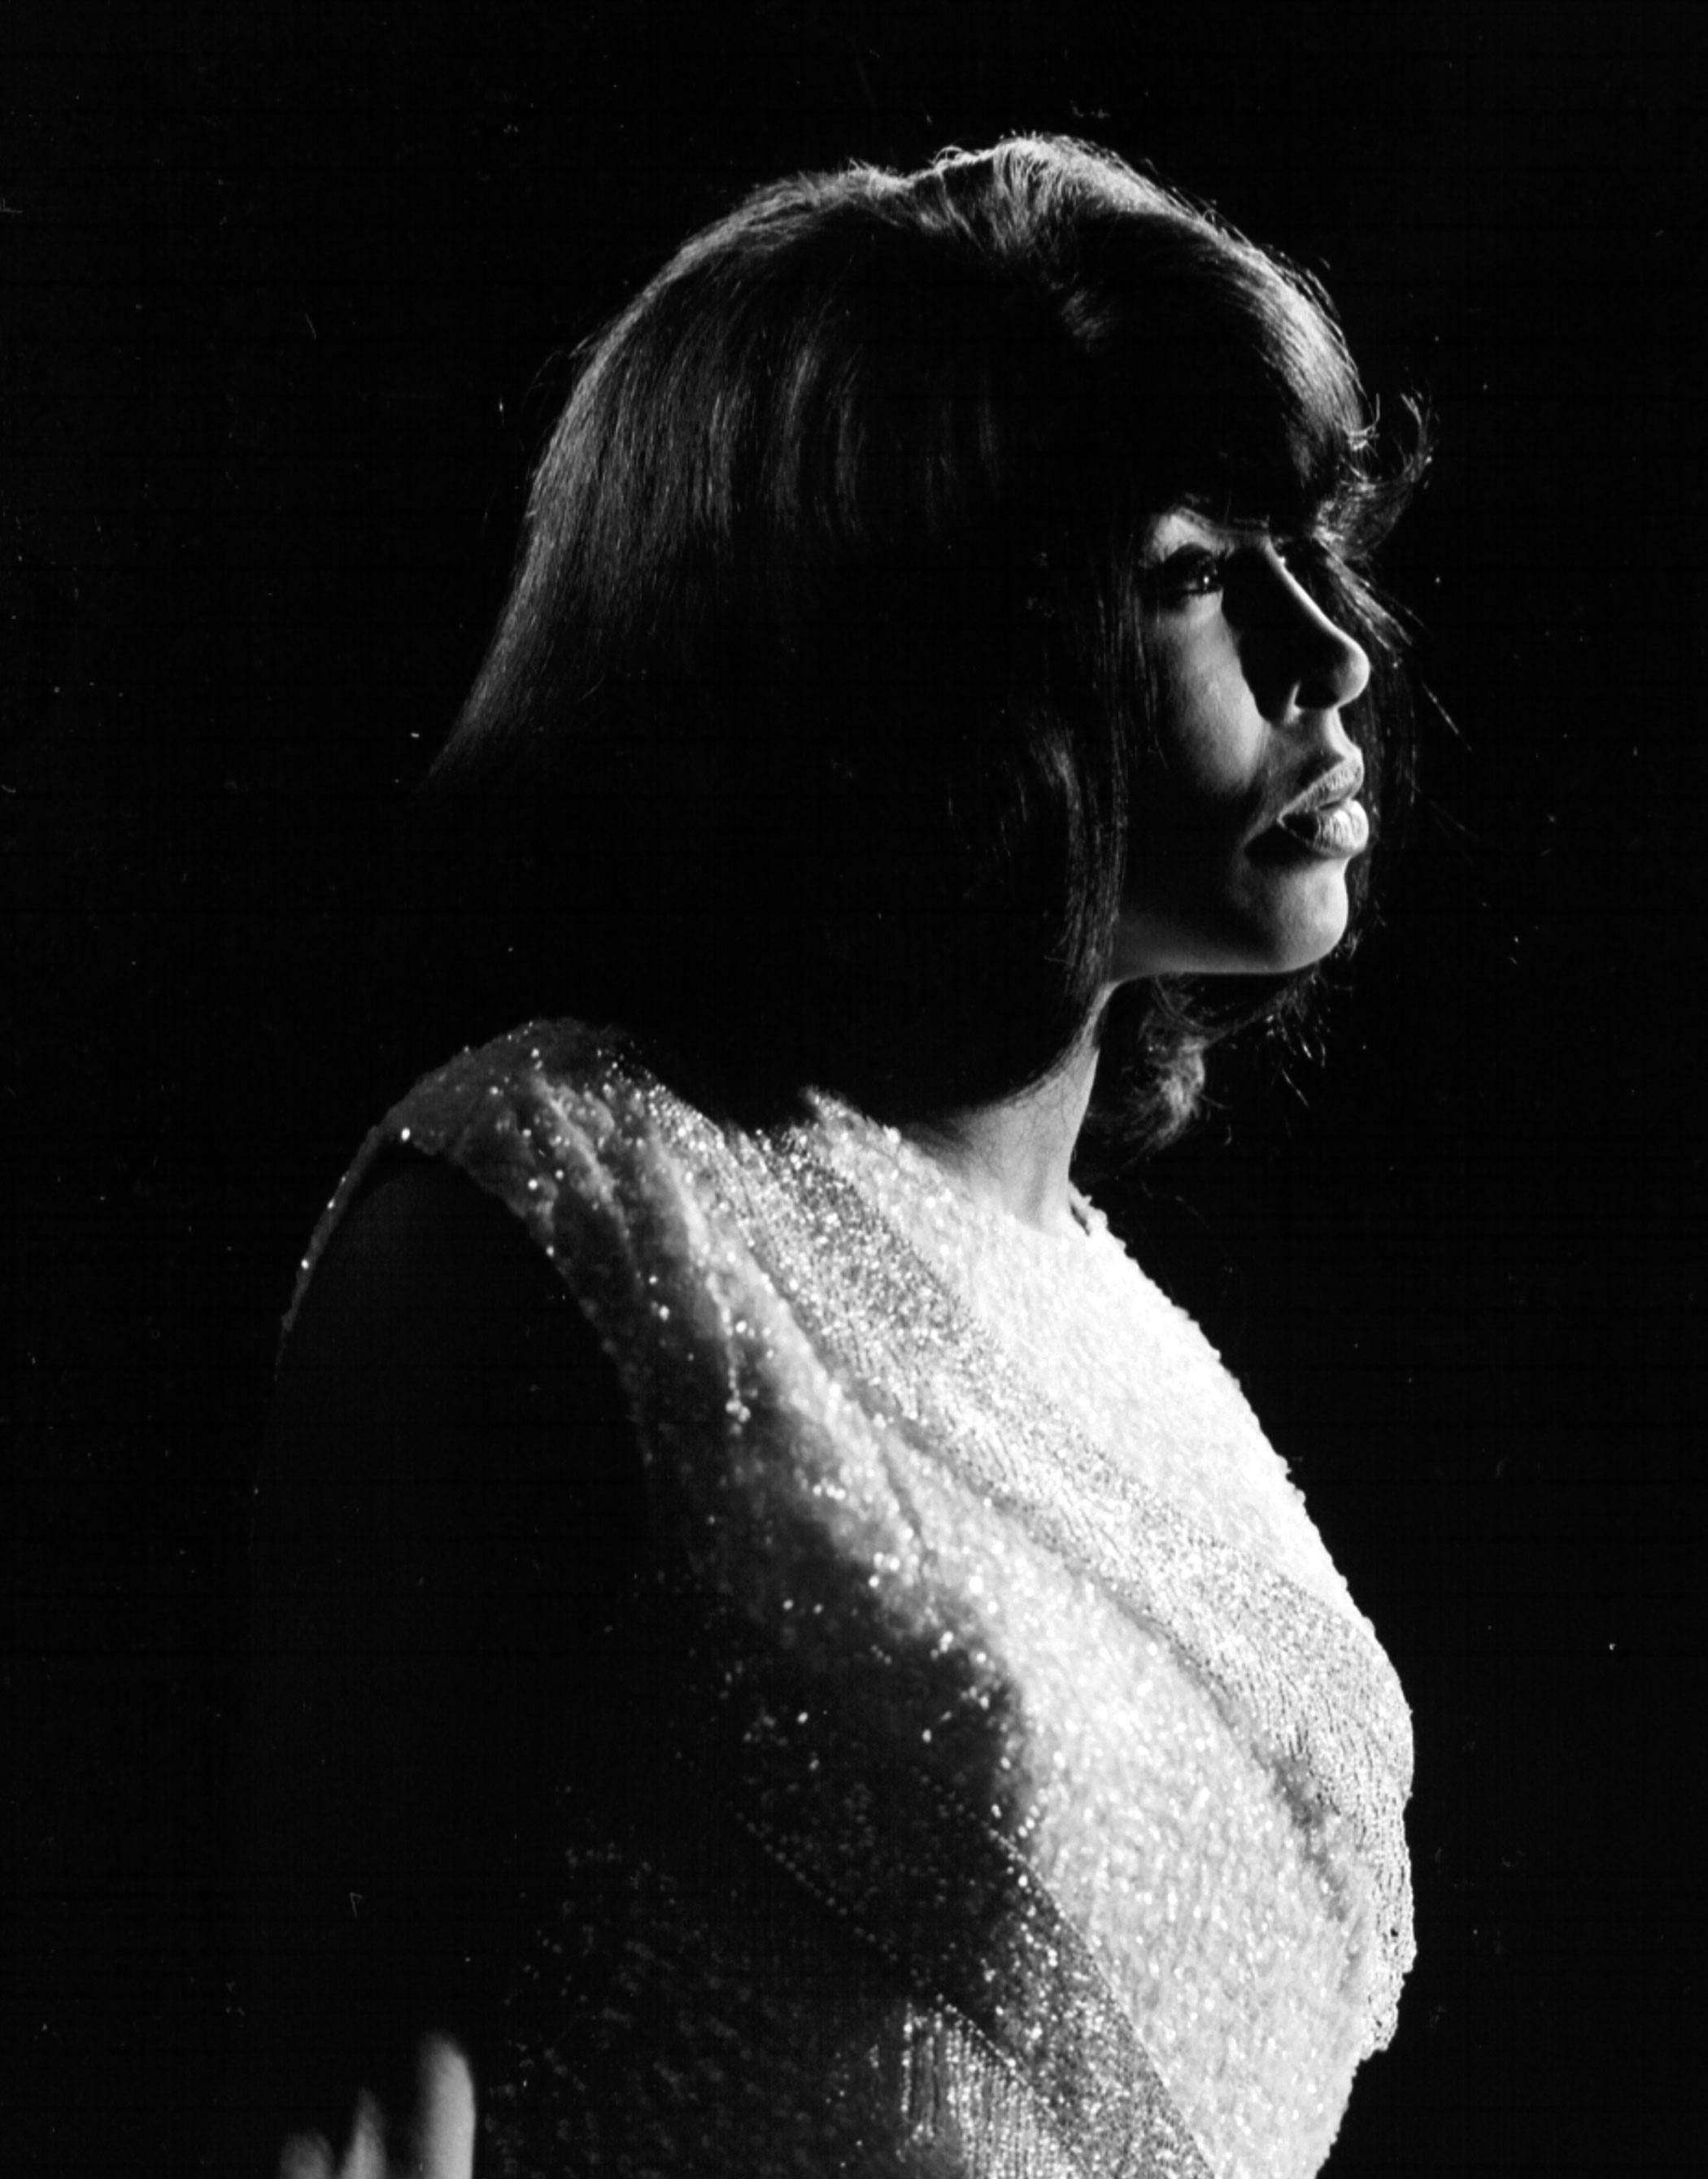 <b>Tina Turner</b> sang the theme song for <i>GoldenEye</i>.